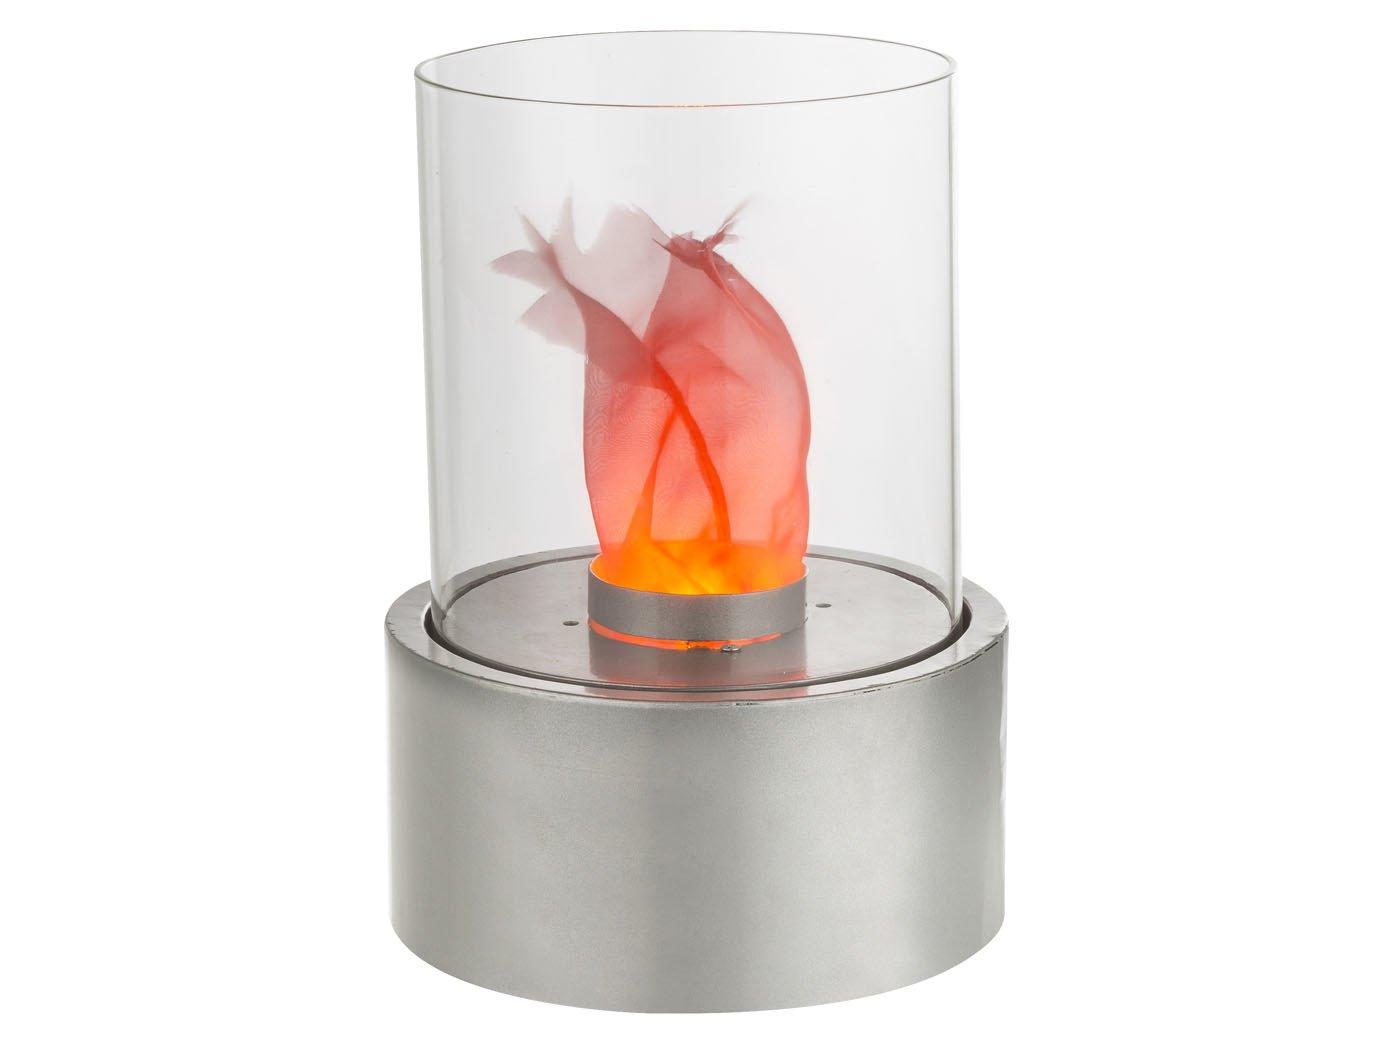 effektvolle LED Lámpara de mesa Fire en diseño - Chimenea de mesa ...